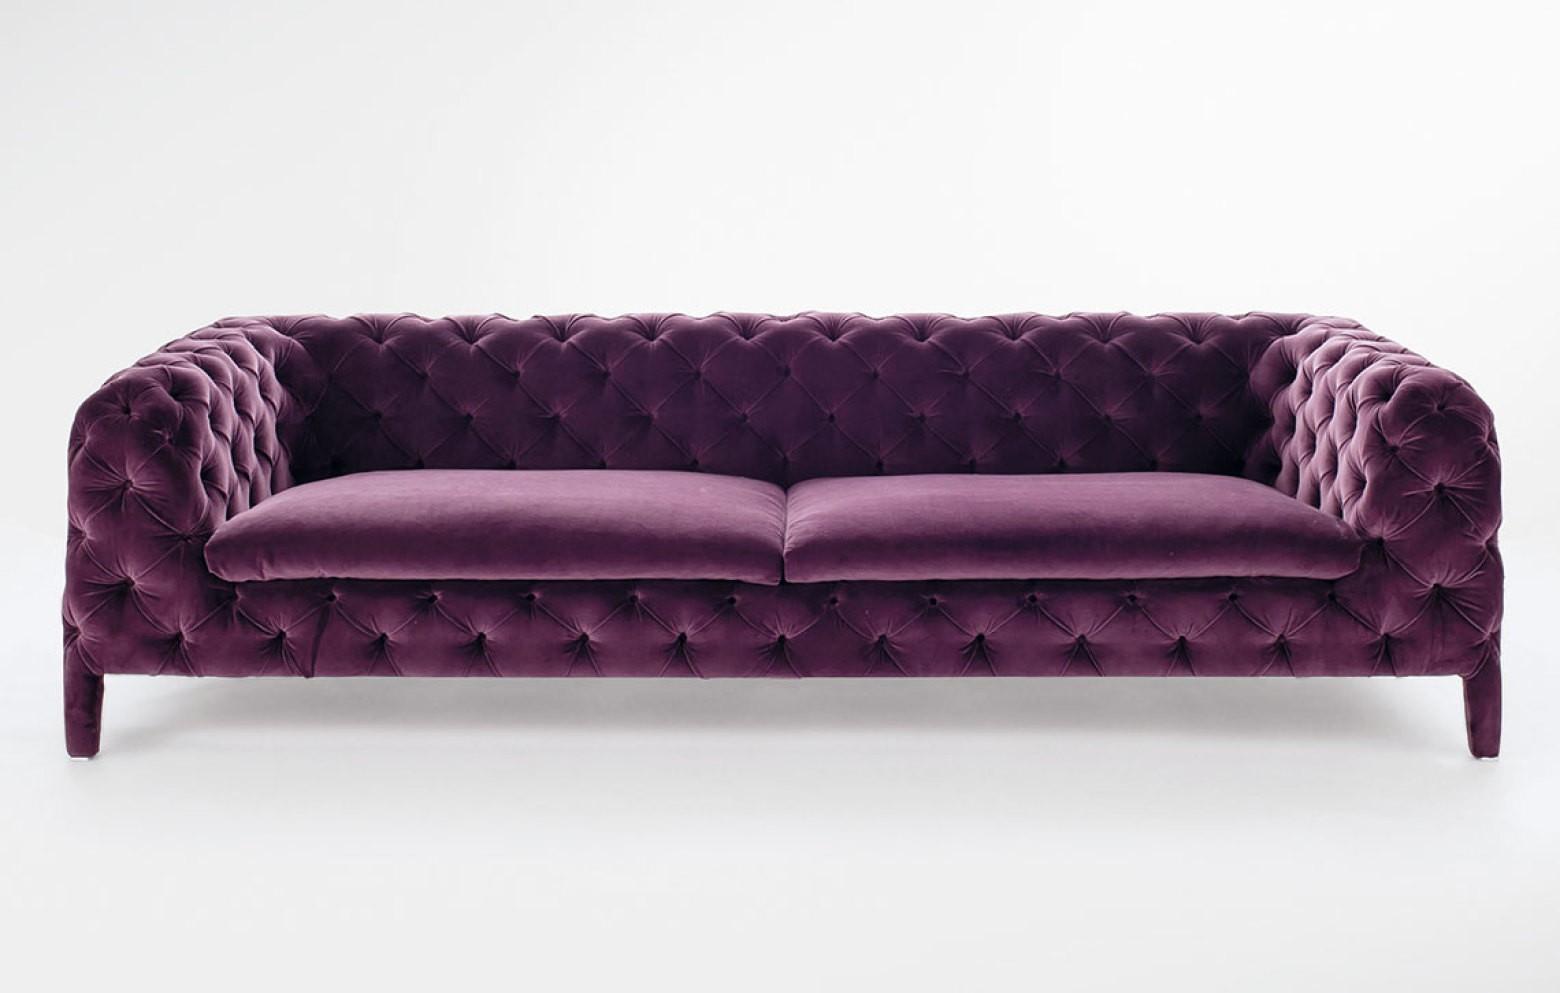 windsor einzelsofas polsterm bel who 39 s perfect. Black Bedroom Furniture Sets. Home Design Ideas